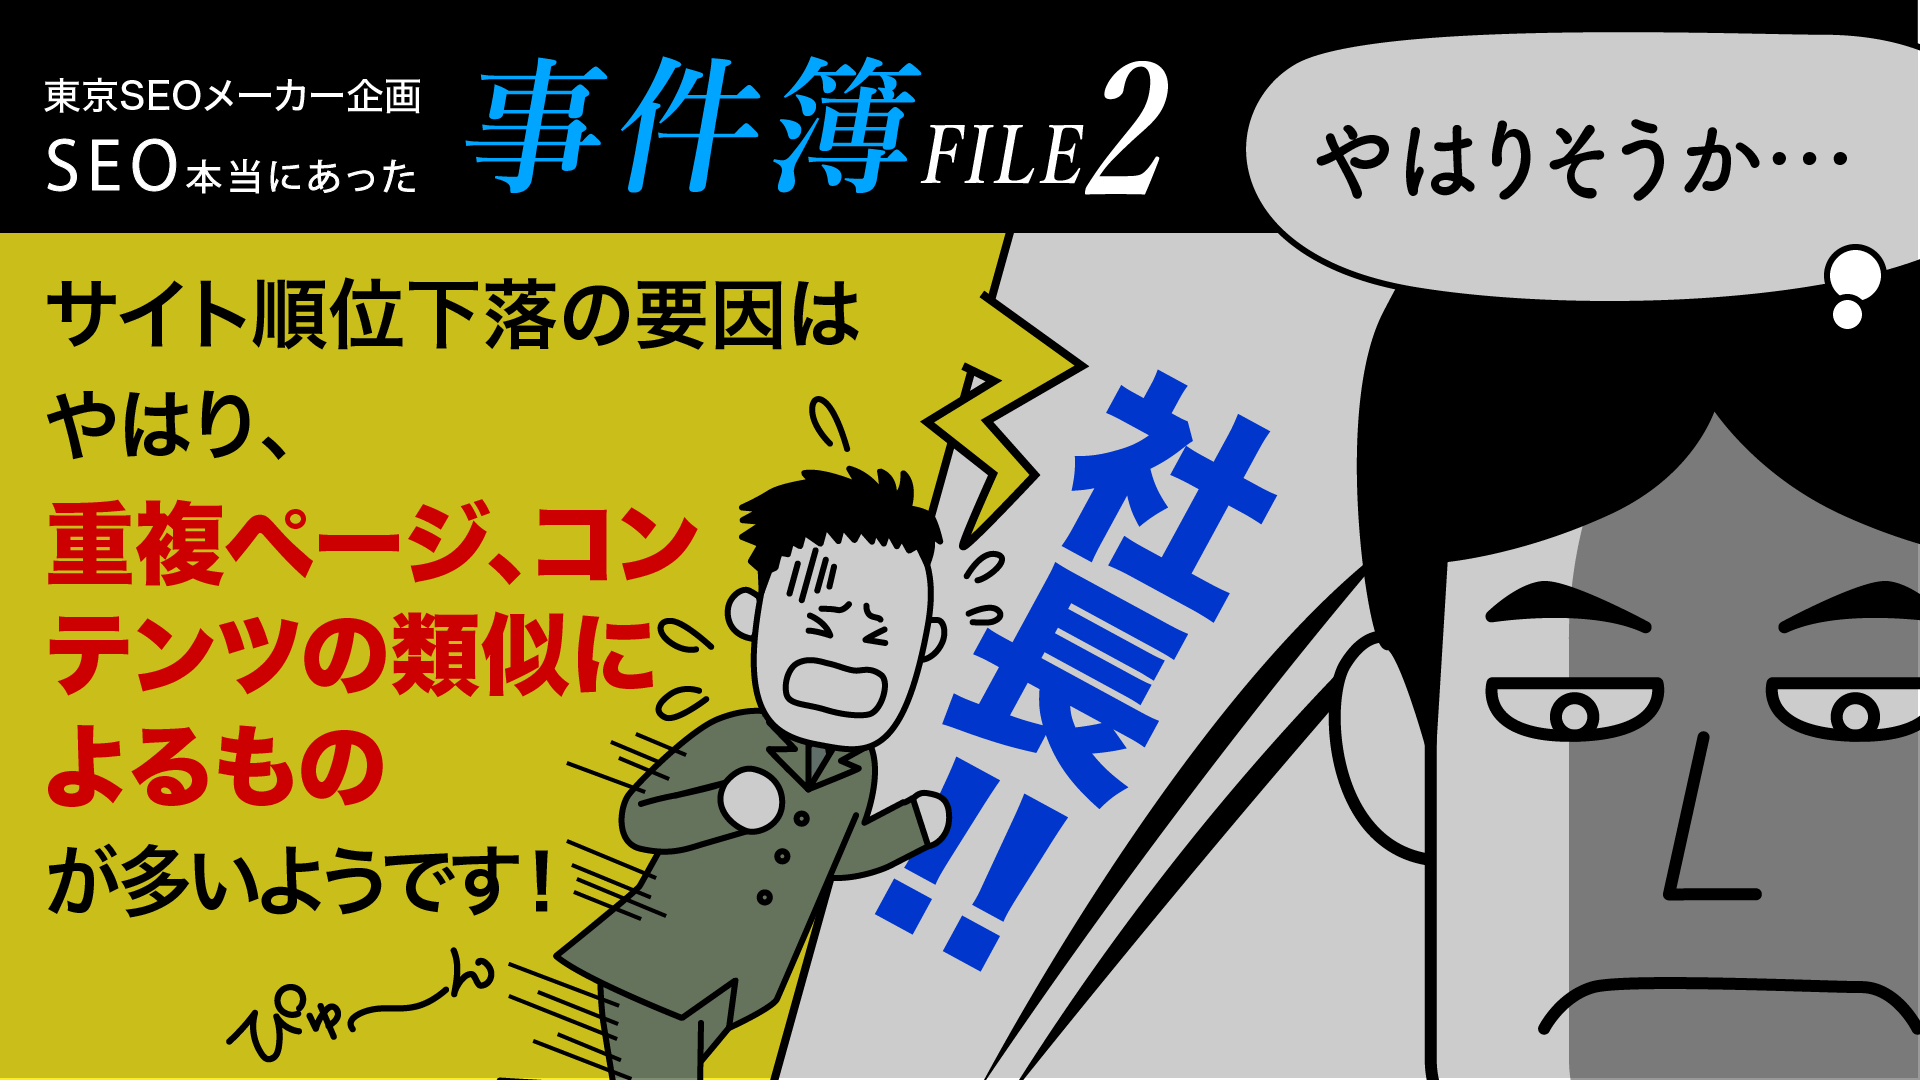 SEO本当にあった事件簿File2-①